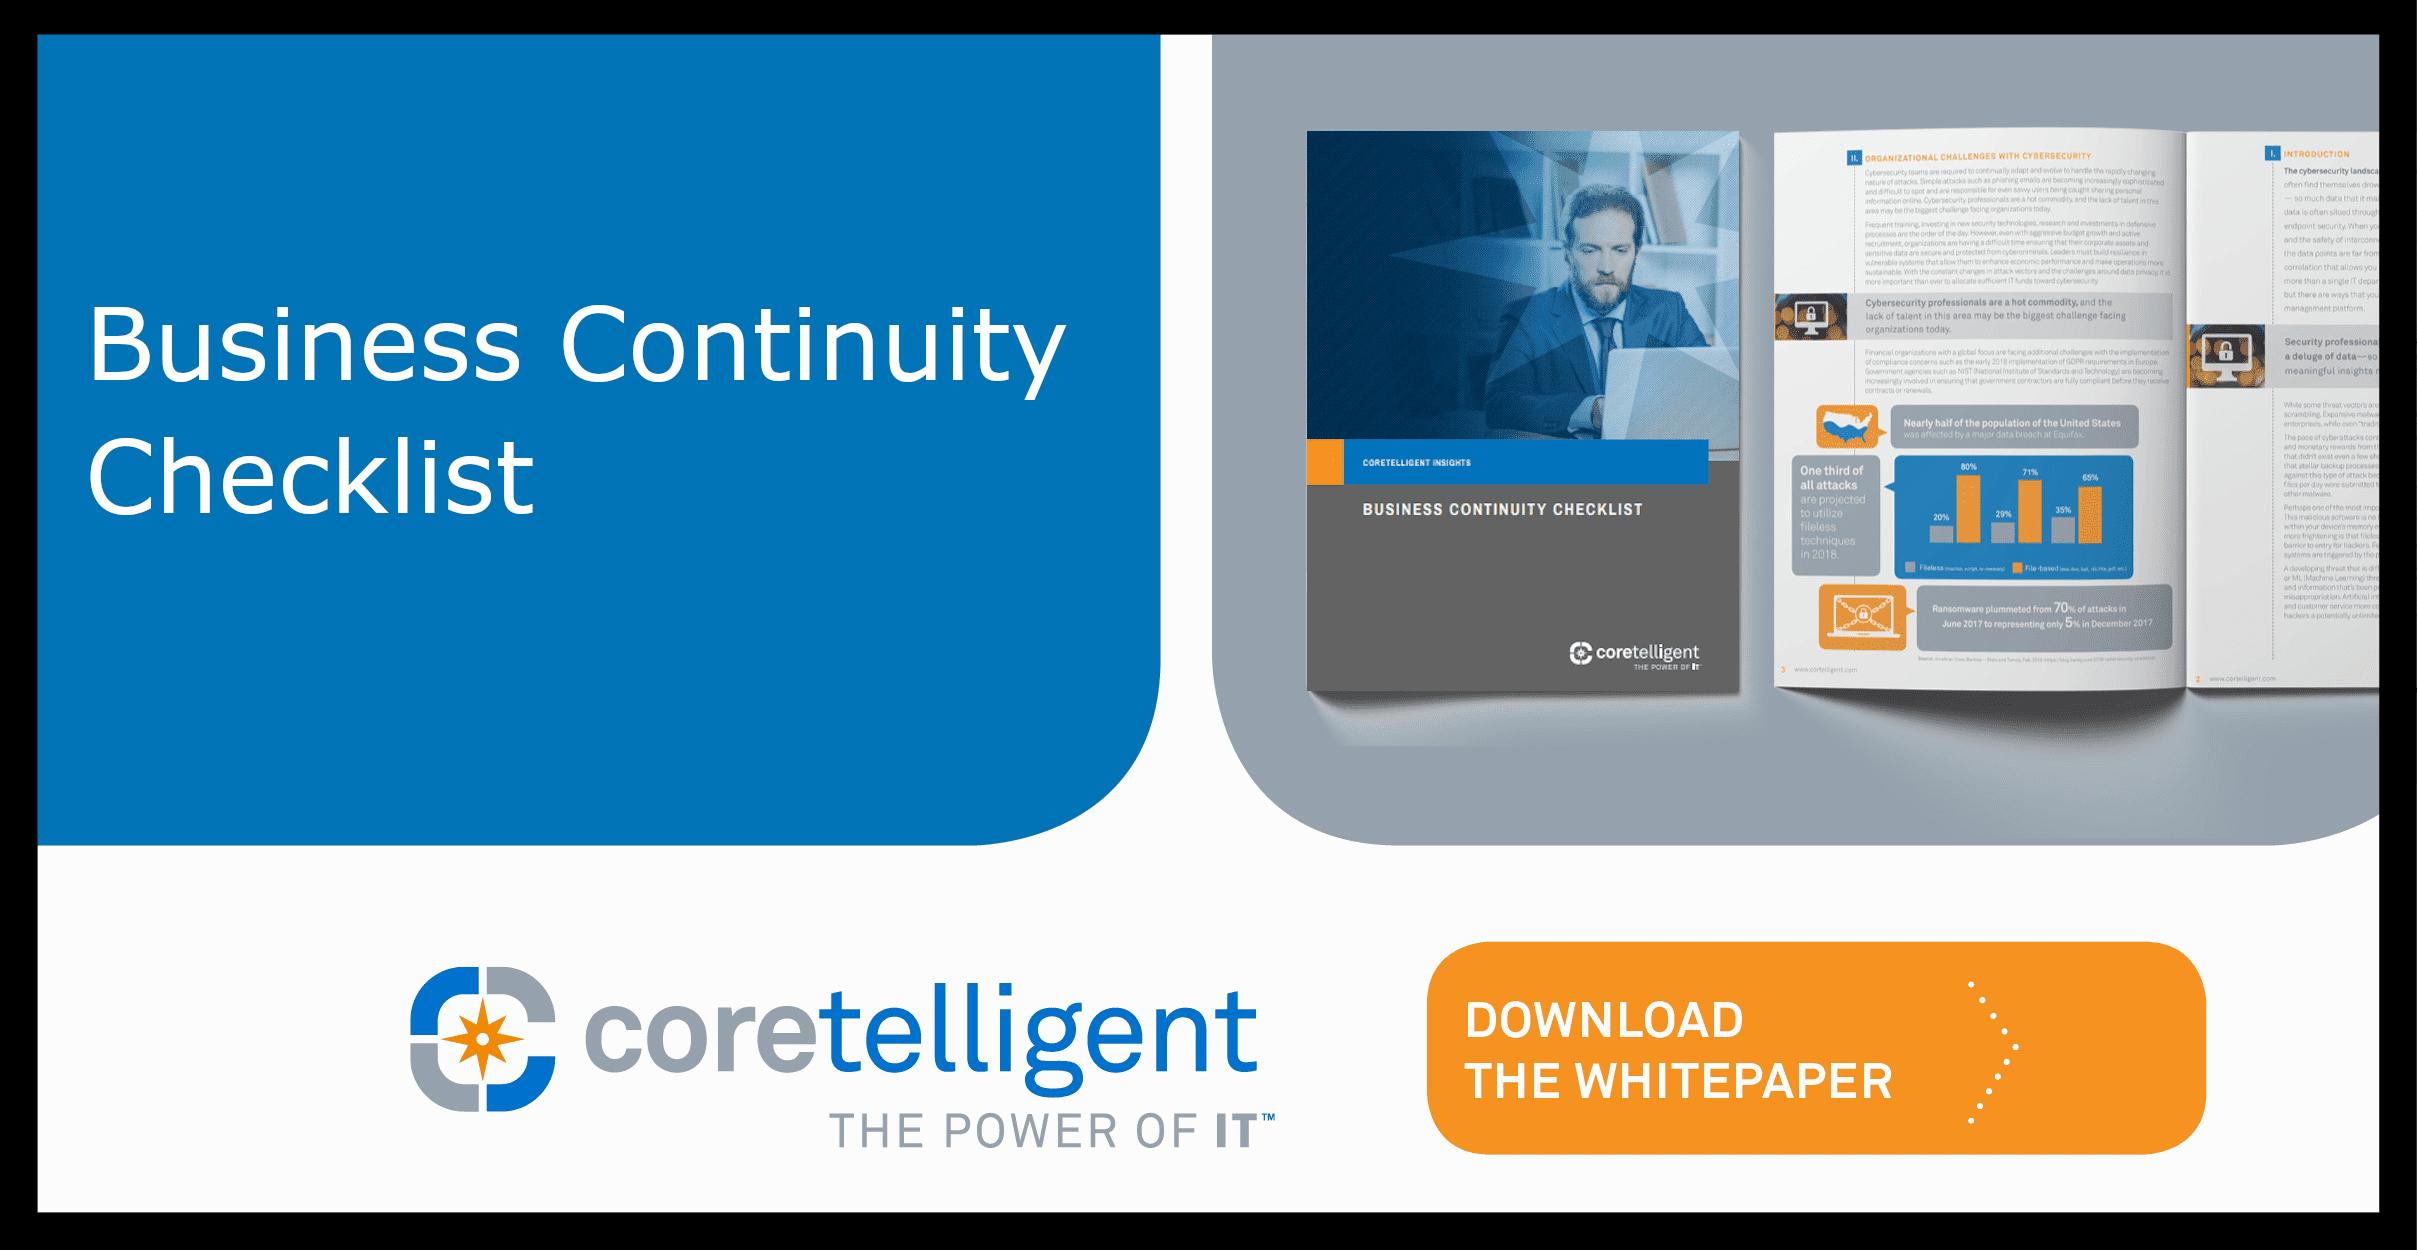 Business Continuity Checklist Whitepaper